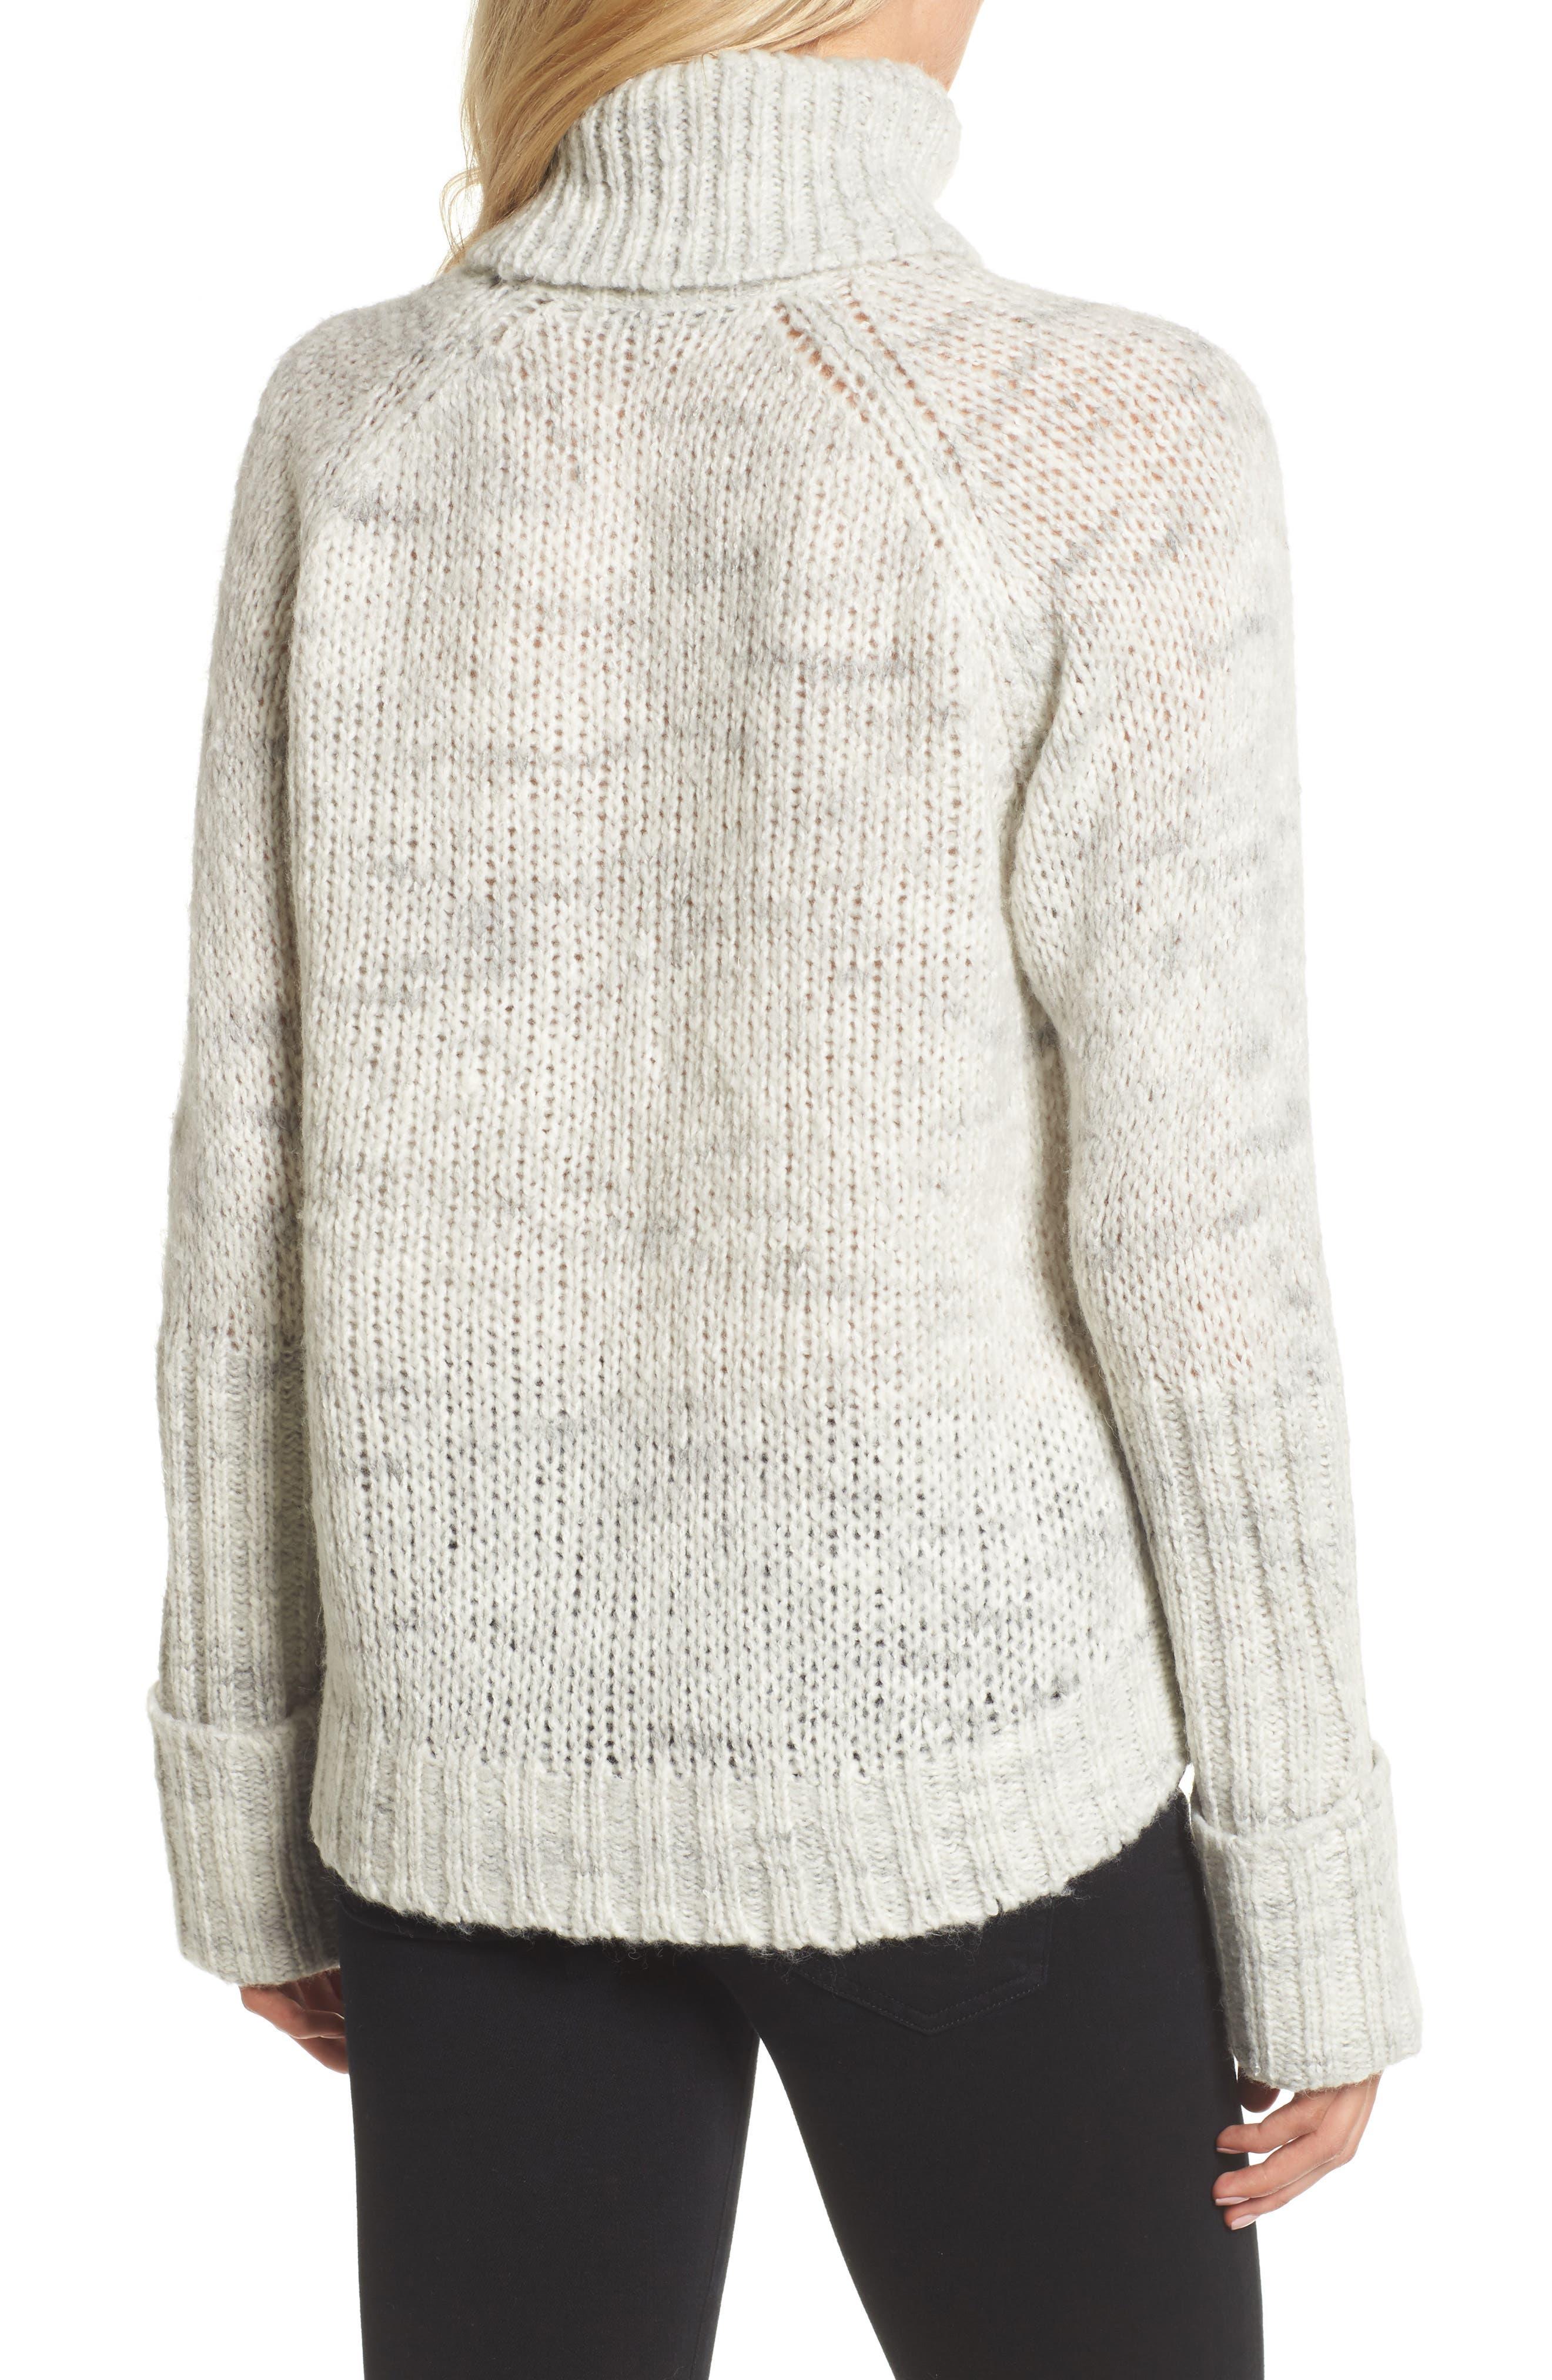 Turtleneck Sweater,                             Alternate thumbnail 2, color,                             020